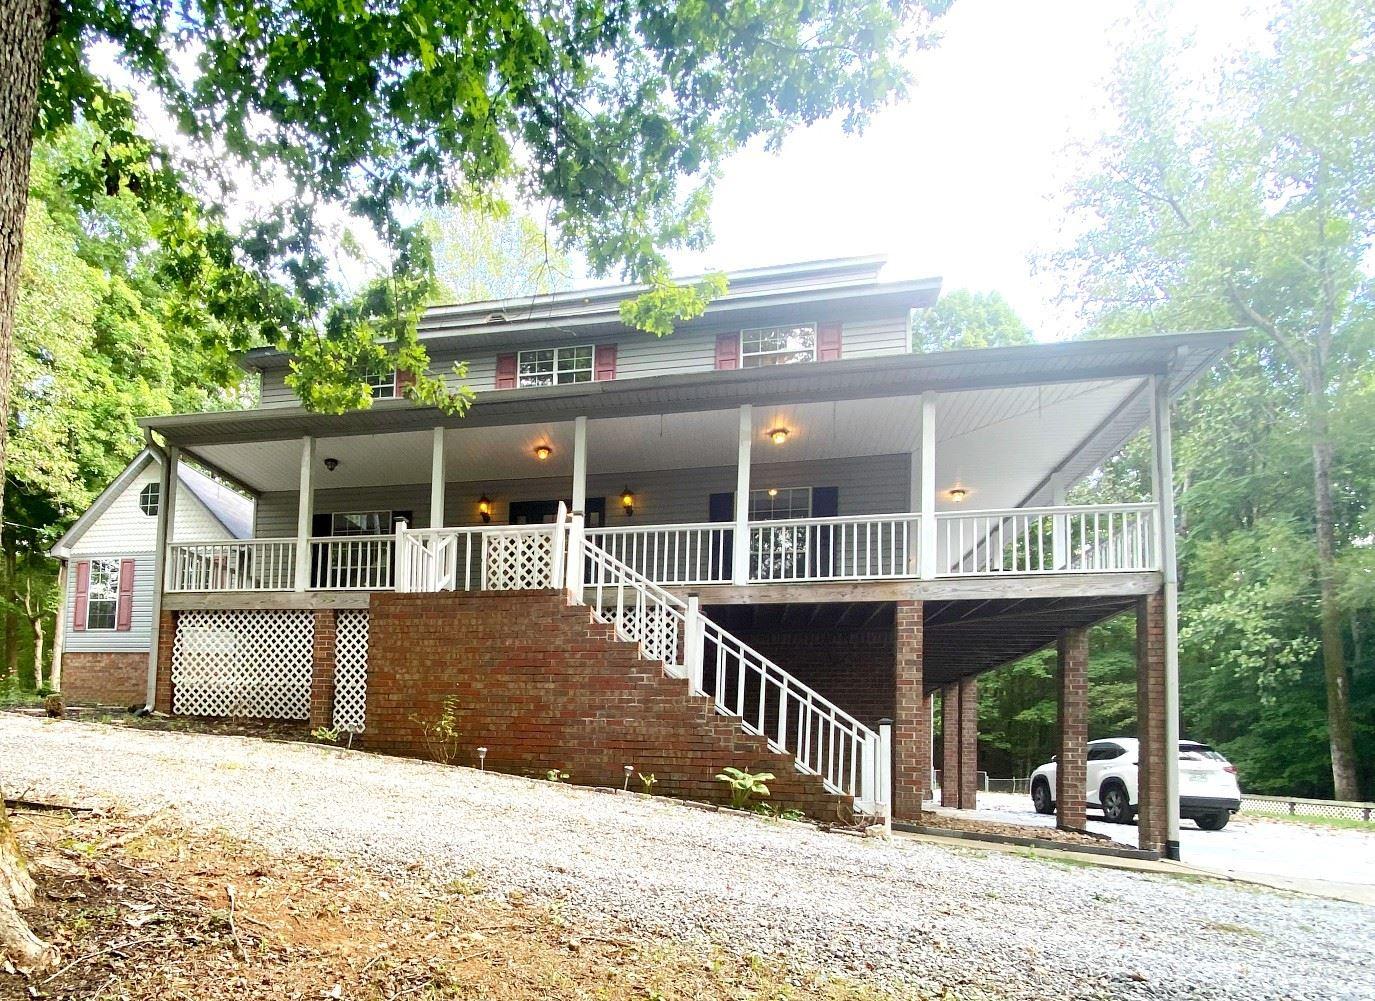 Photo for 1560 Dickens Ln, Goodlettsville, TN 37072 (MLS # 2292142)